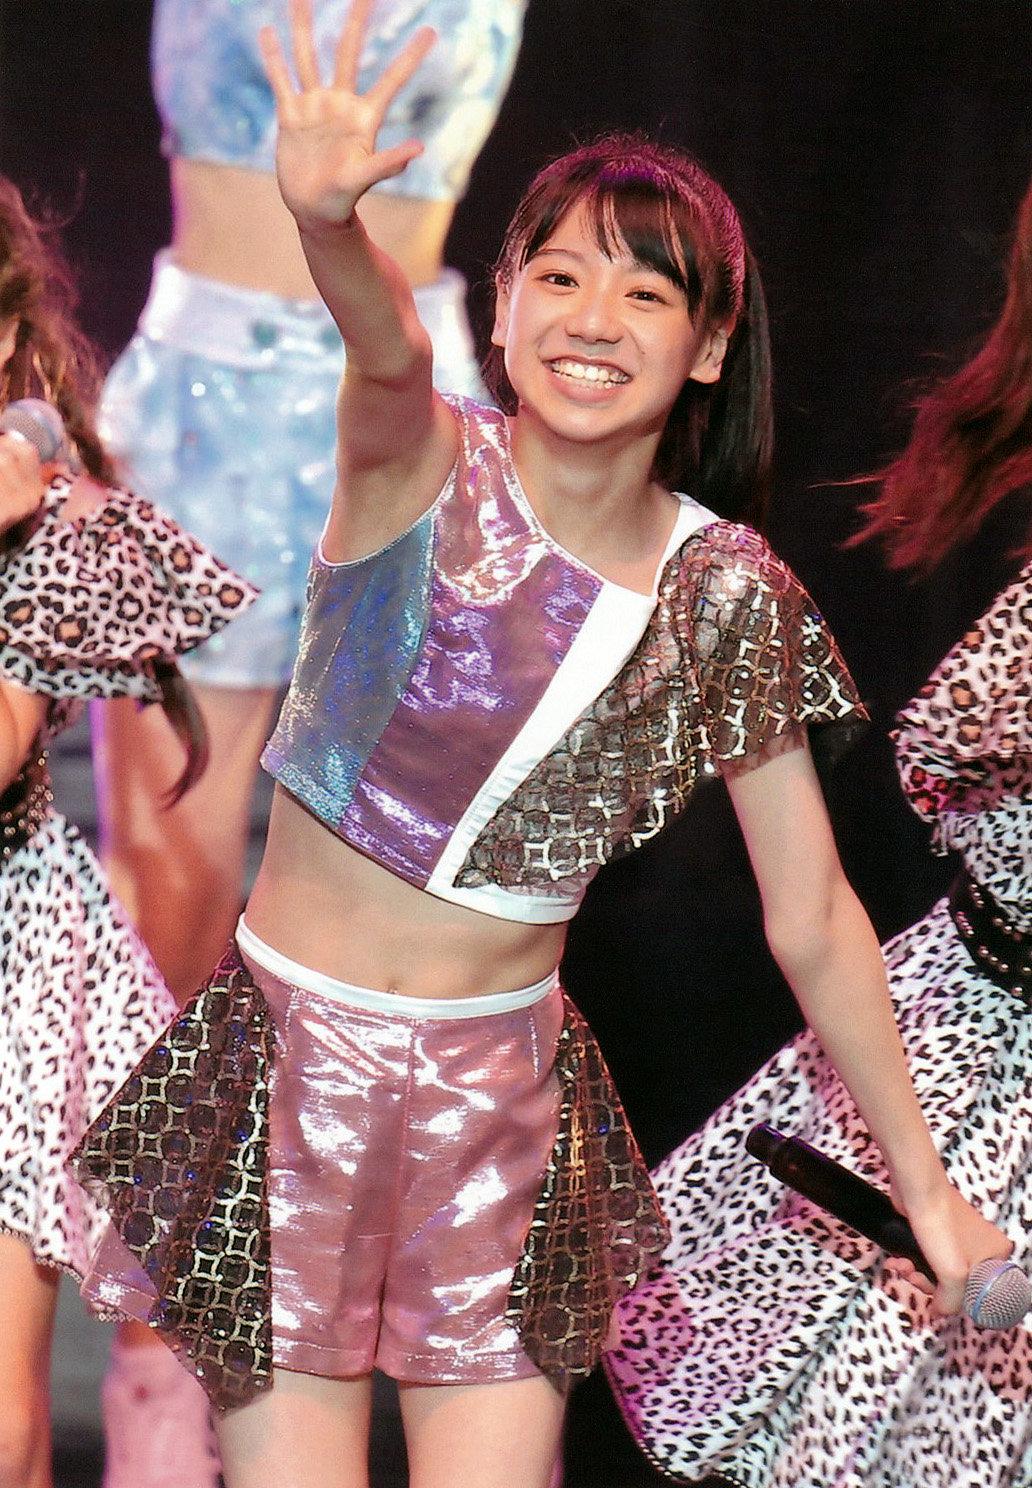 Yonemura%20Kirara-902487_60495ee395e58.jpg